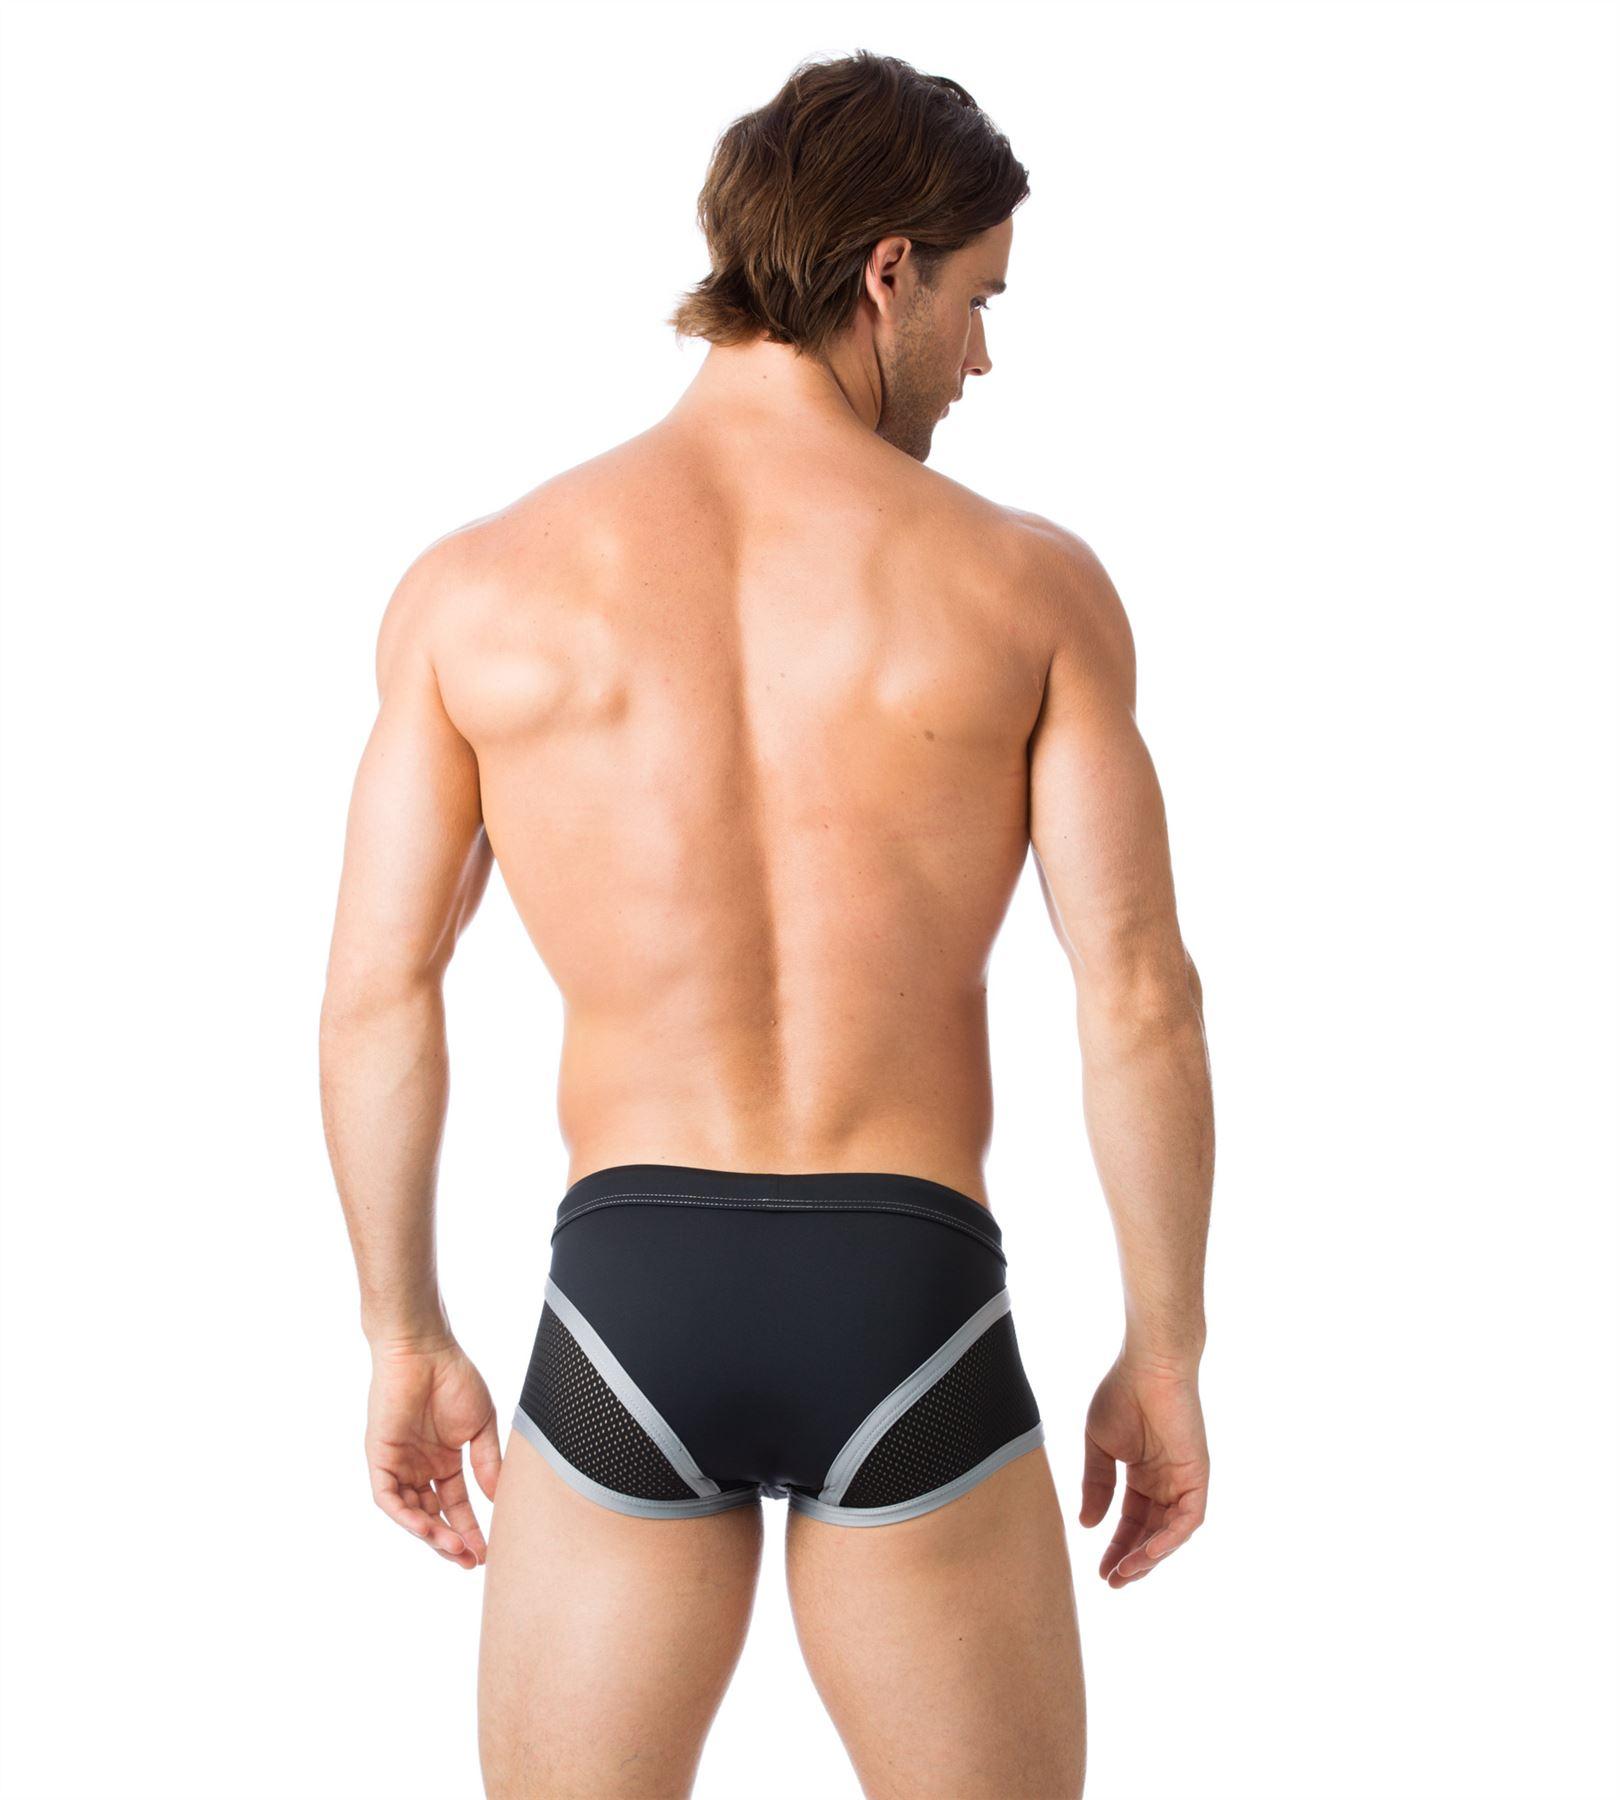 GREGG Homme Men/'s elemento Swim Trunk Boxer Short RRP £ 63.95venditaGioco